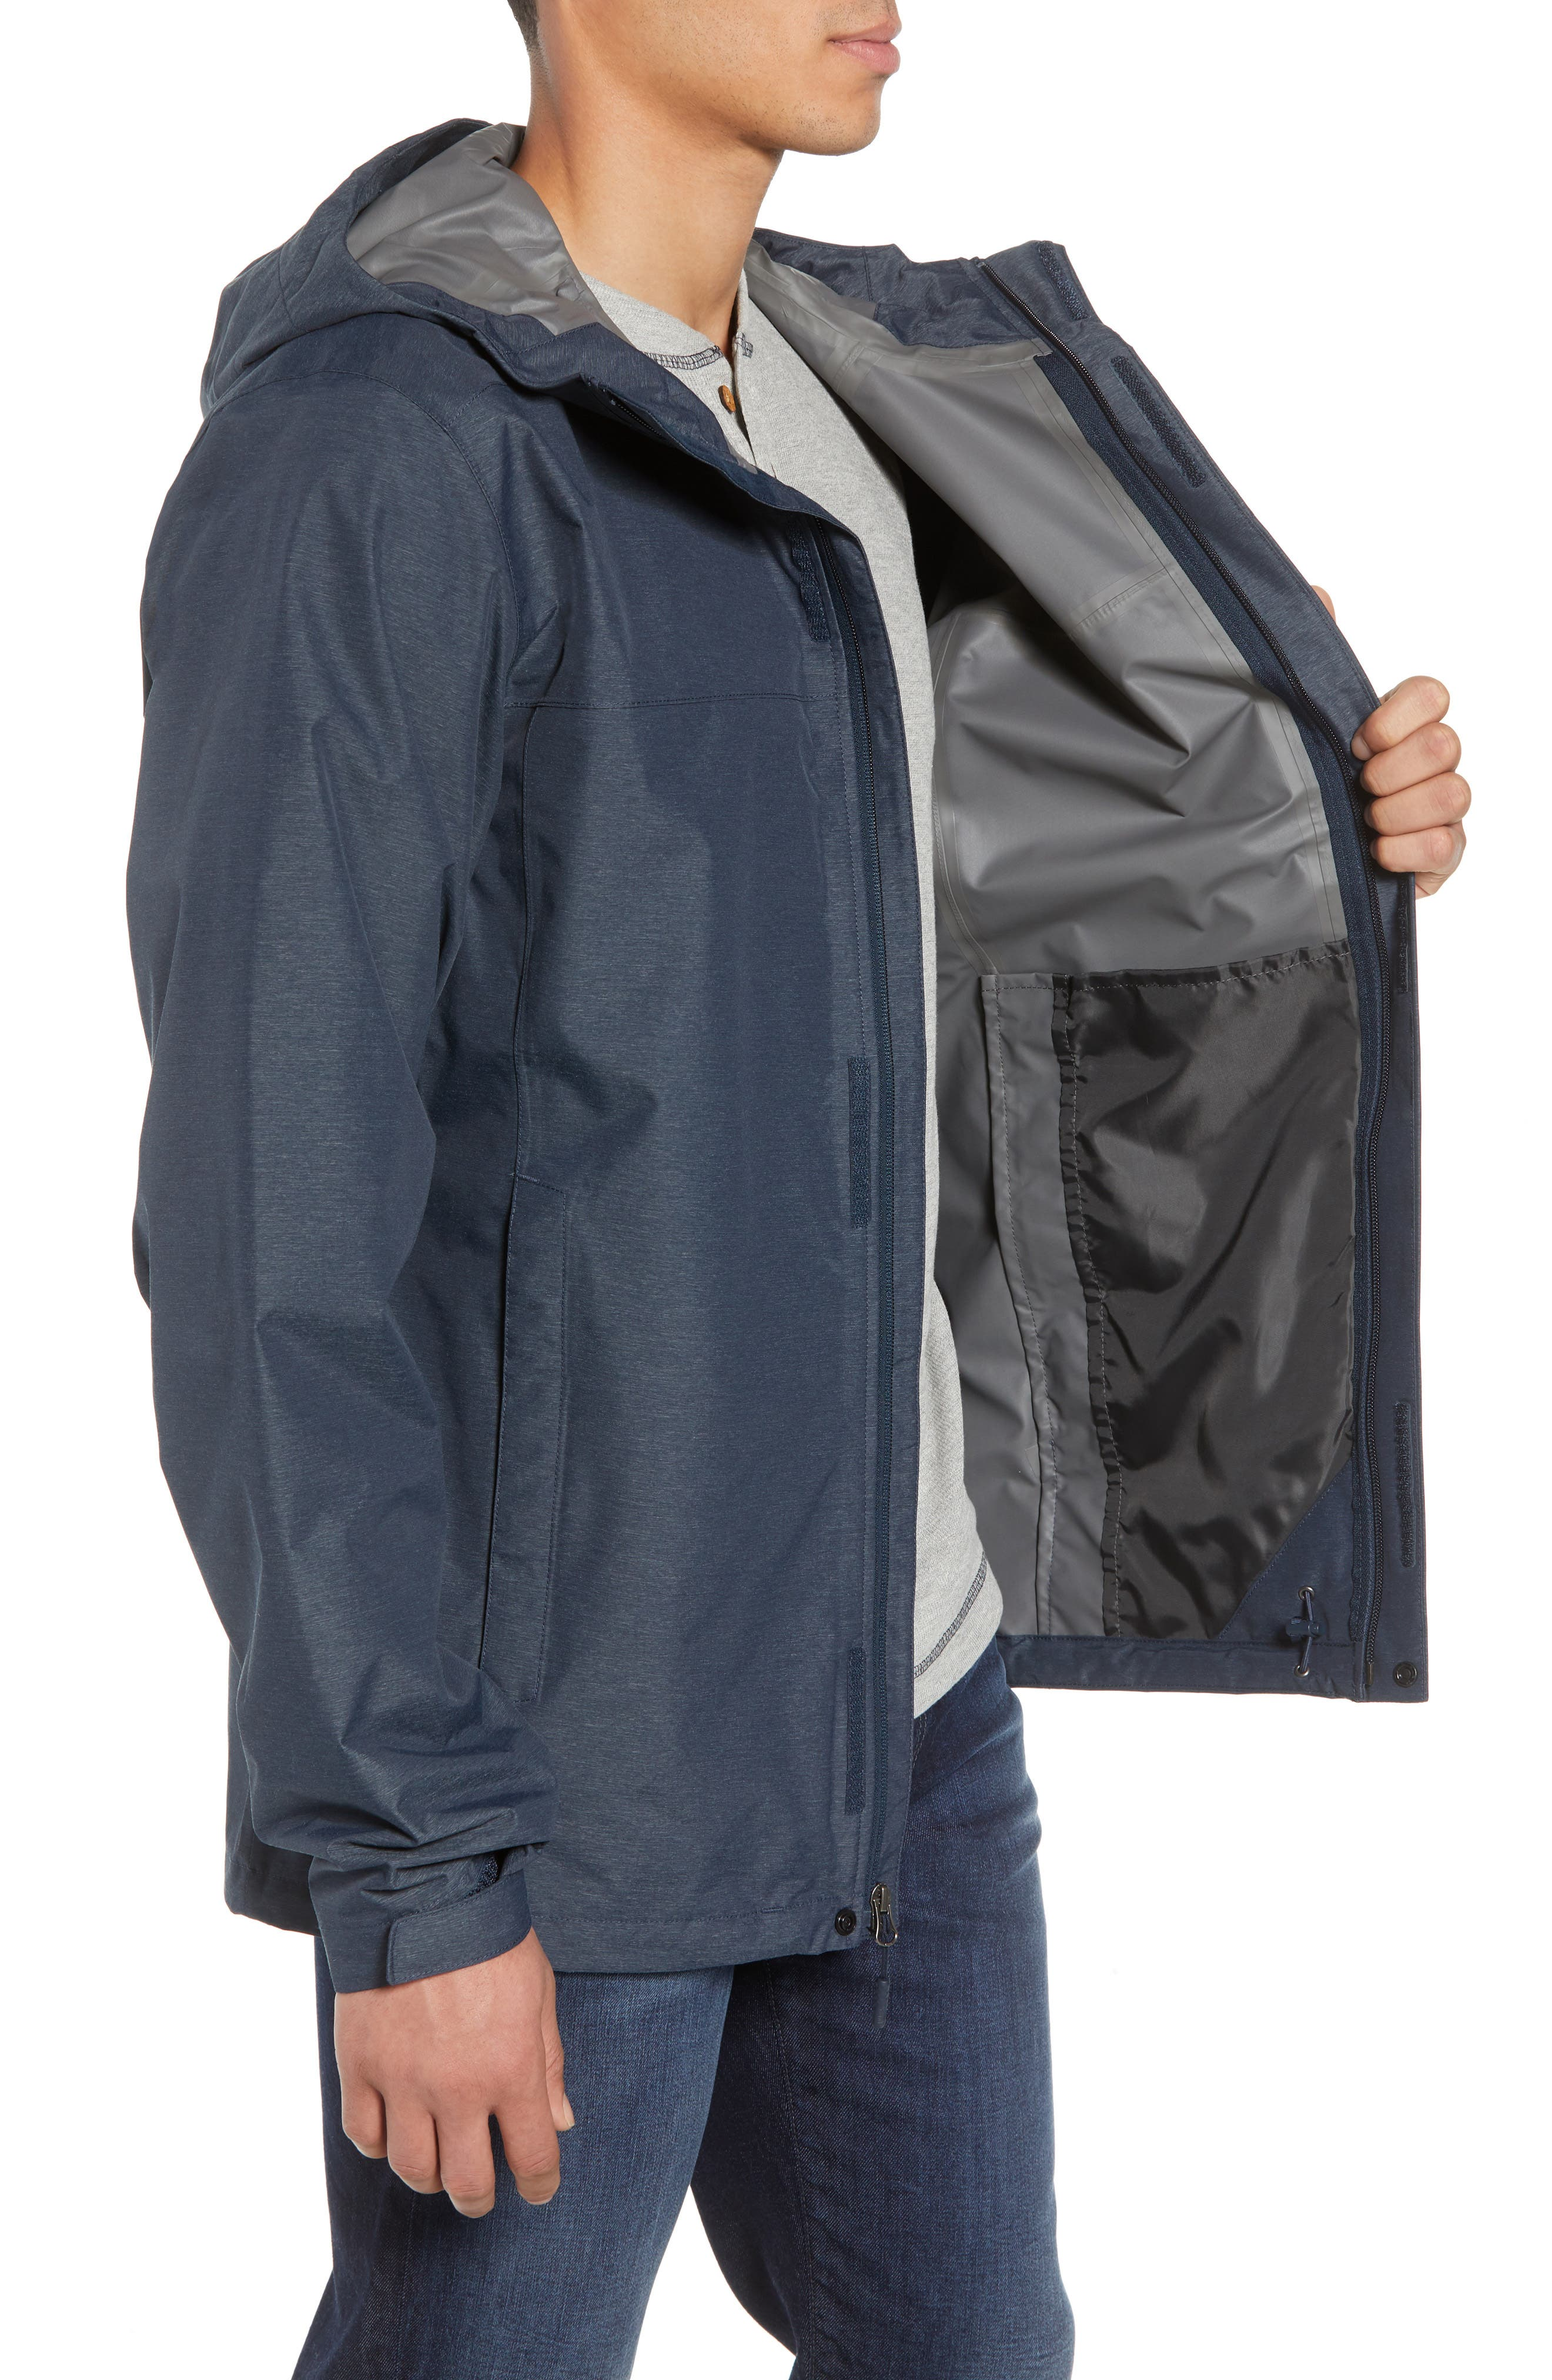 Venture 2 Waterproof Jacket,                             Alternate thumbnail 3, color,                             URBAN NAVY HEATHER